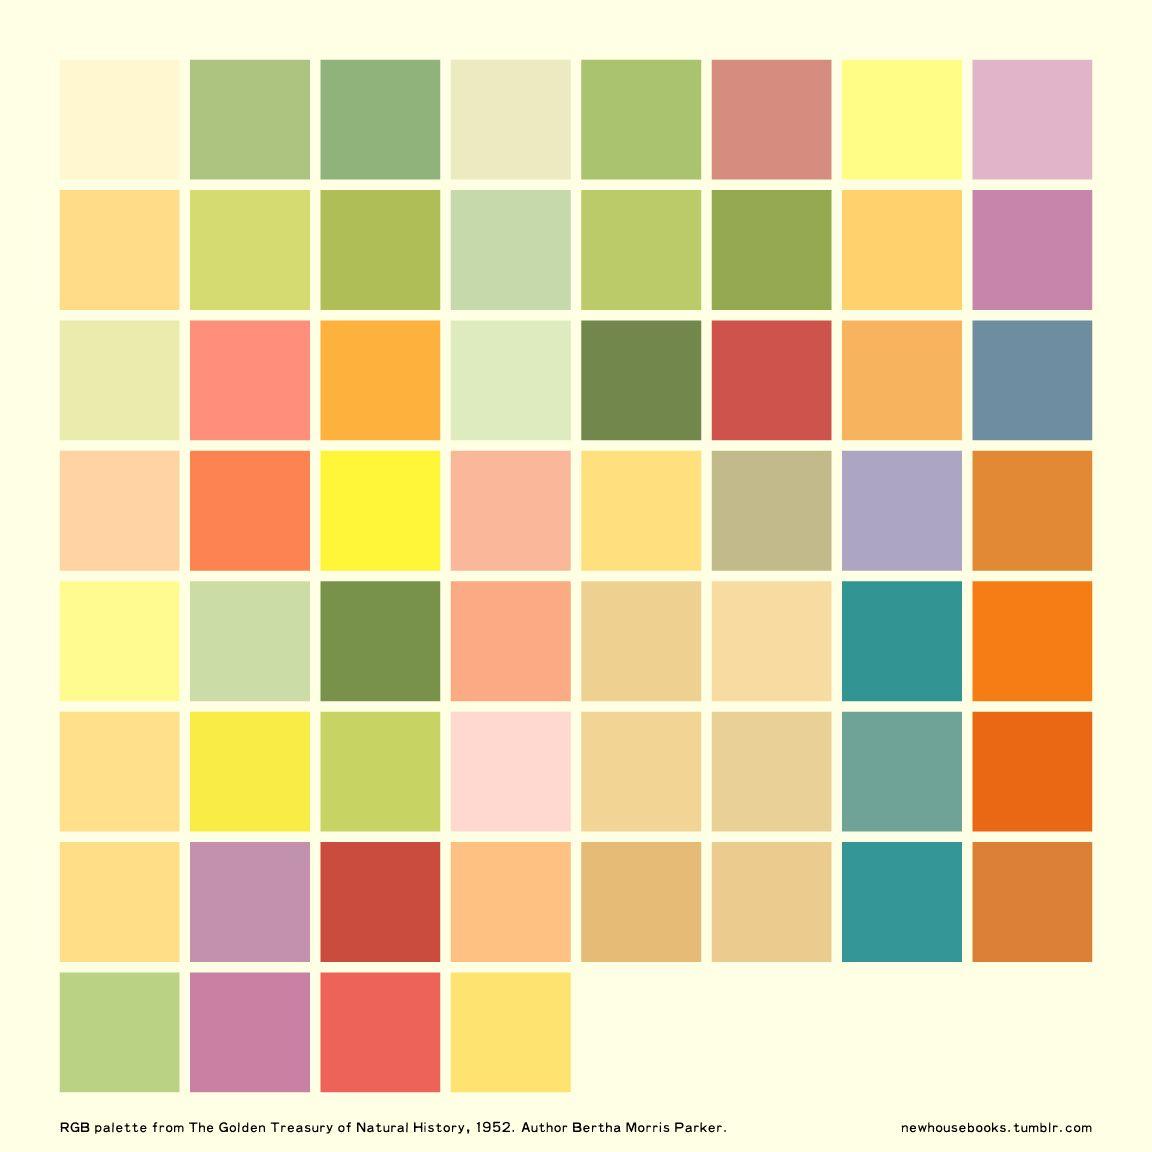 Book color palette - Newhousebooks Golden Books 1952 Color Palette Ai File